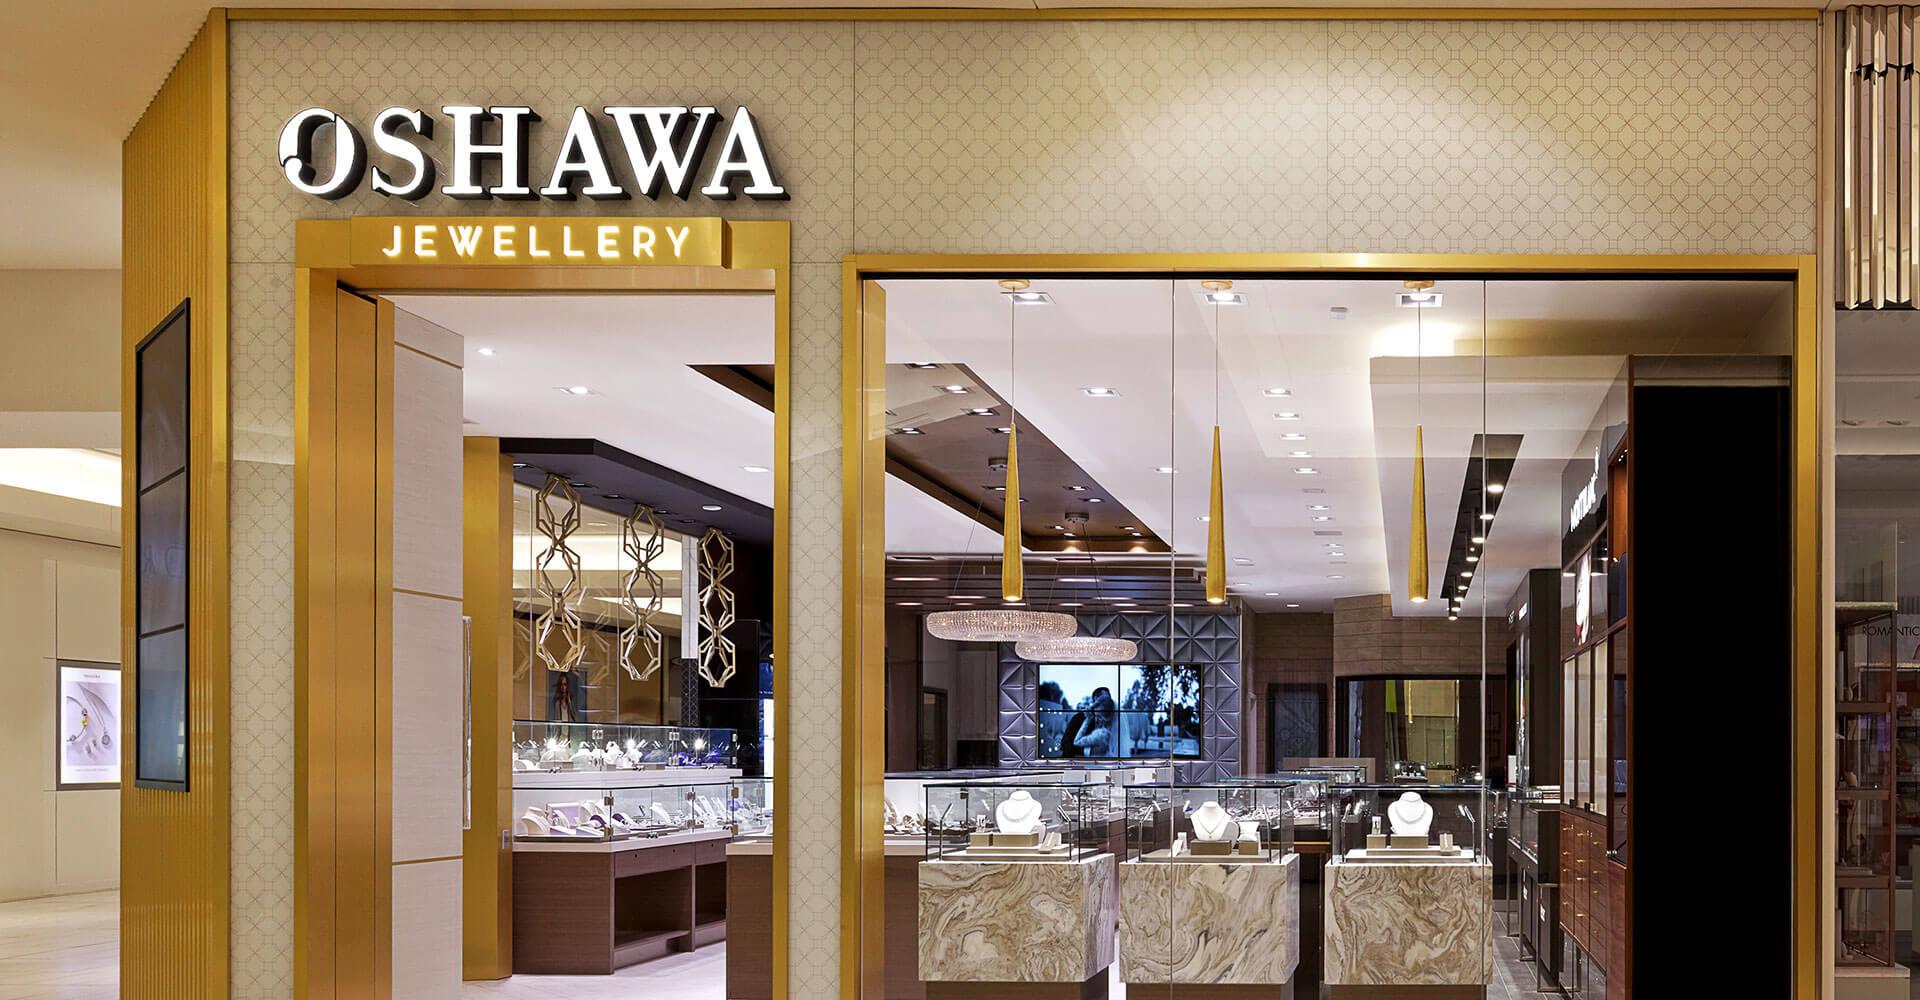 Oshawa Jewellery